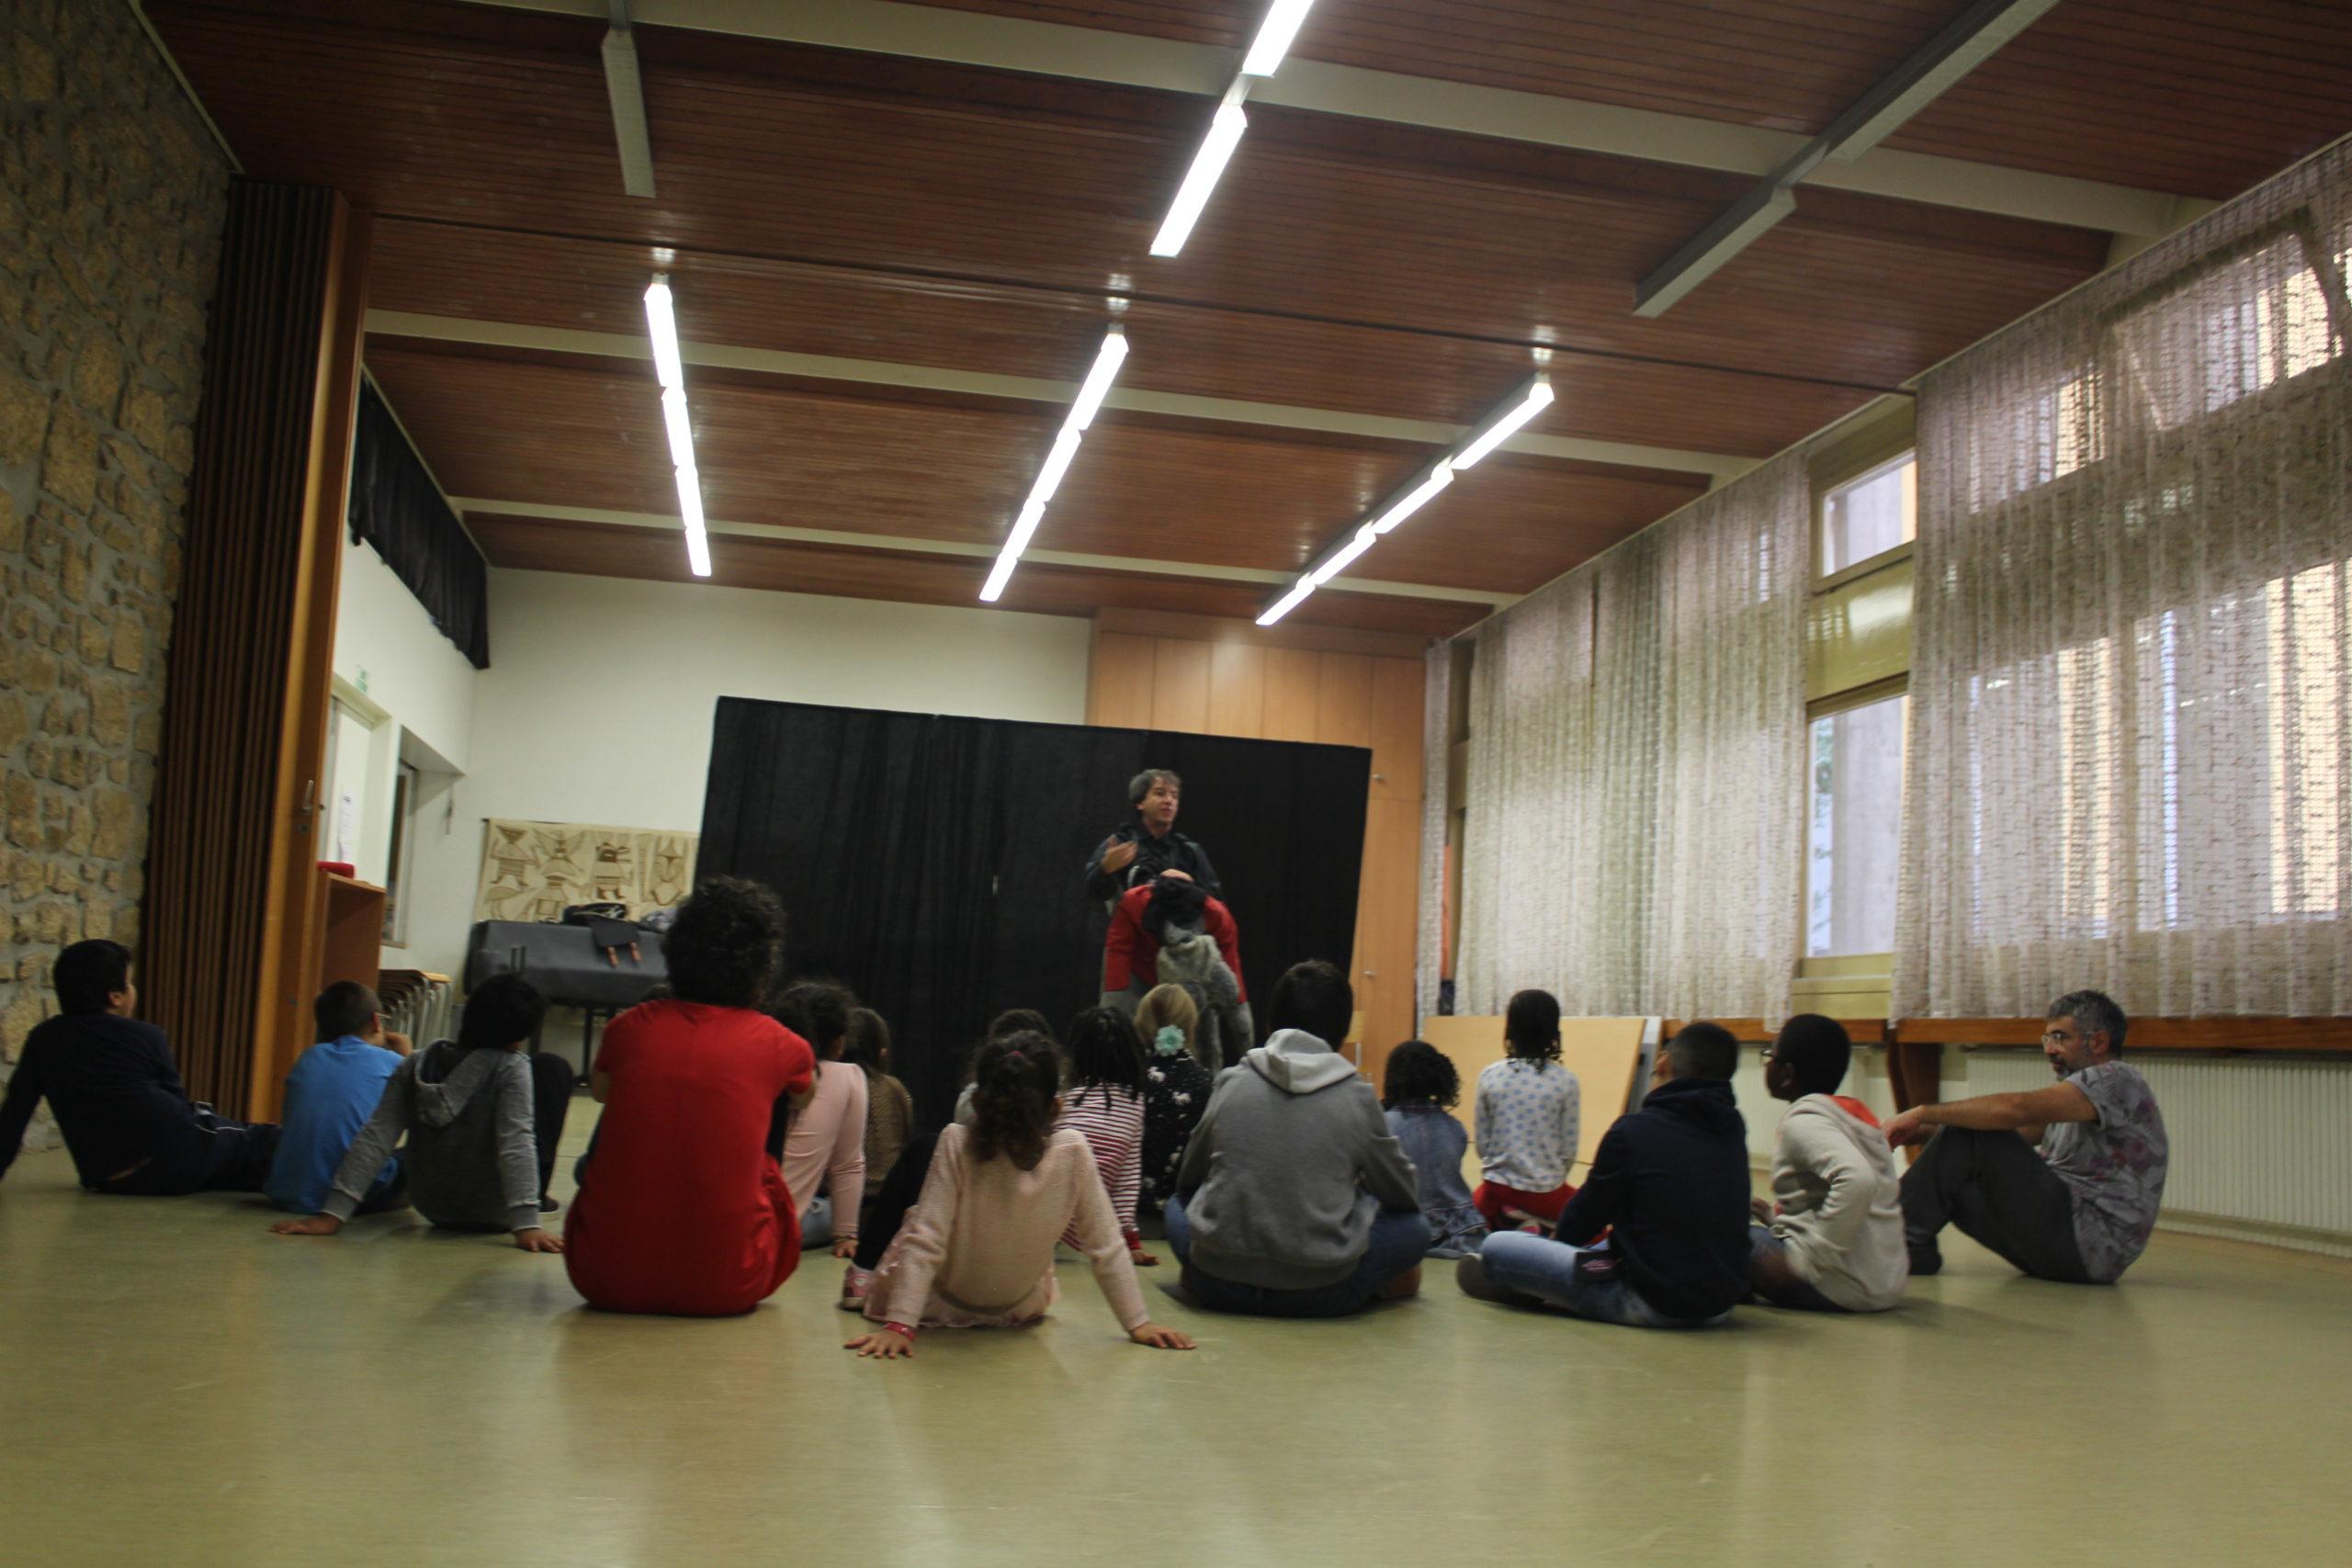 Salle Maladière